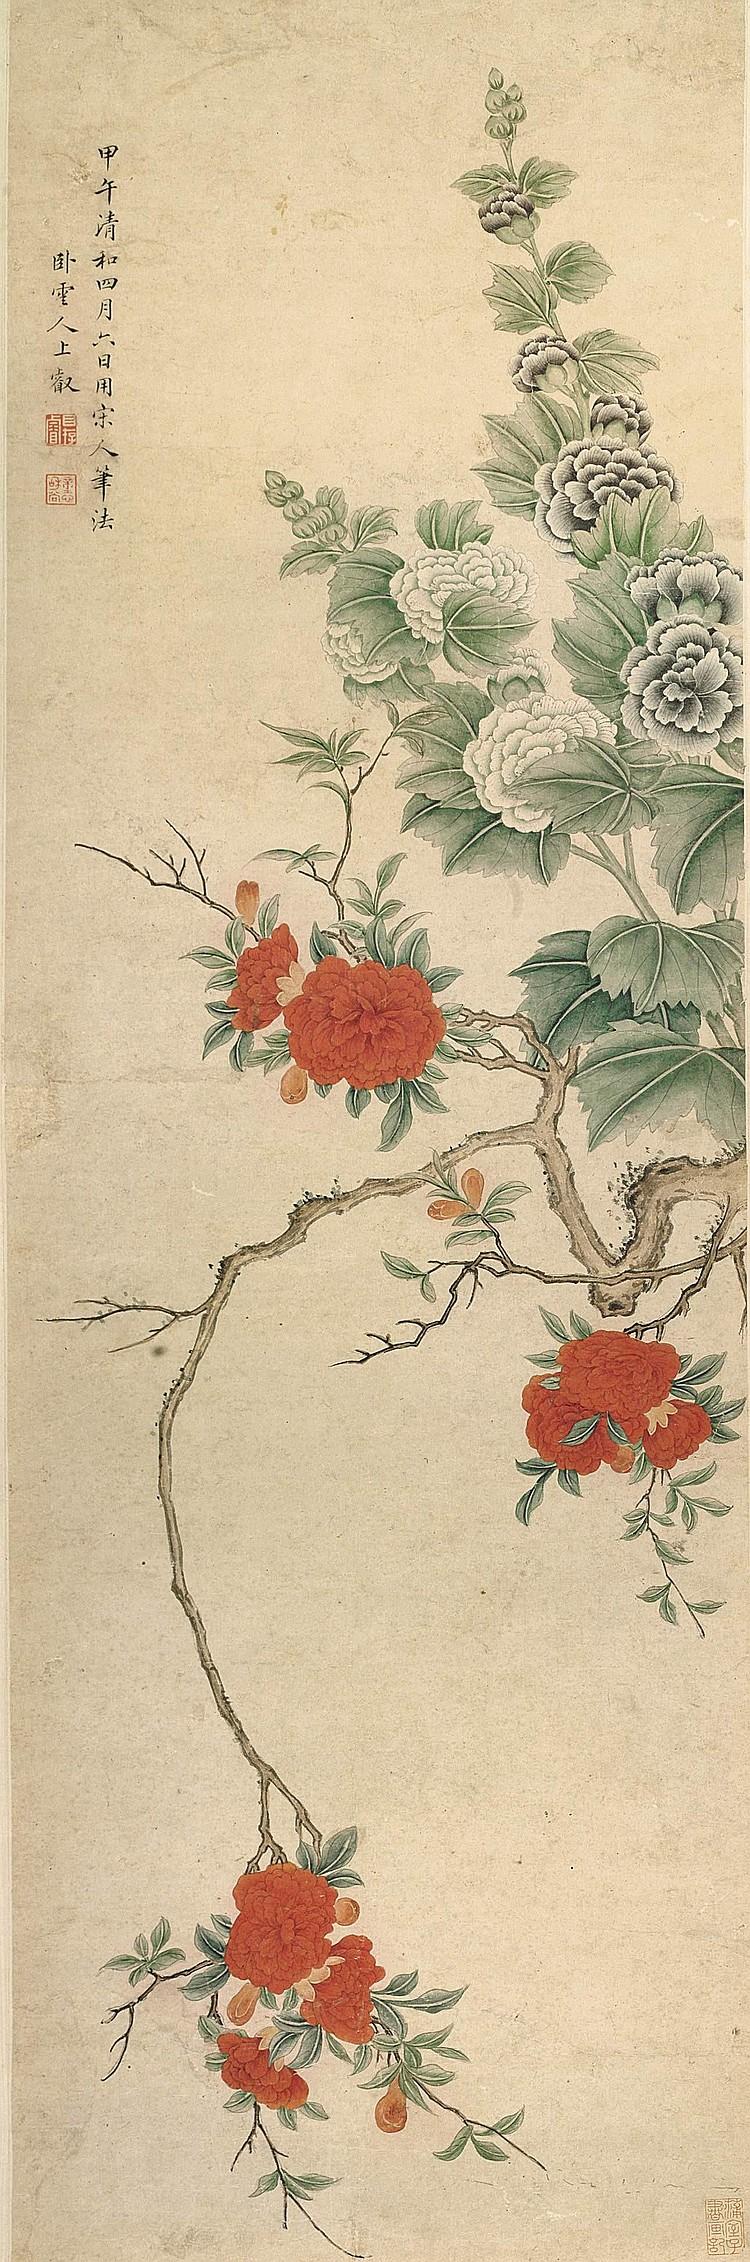 SHANG RUI (1634-CA. 1724)